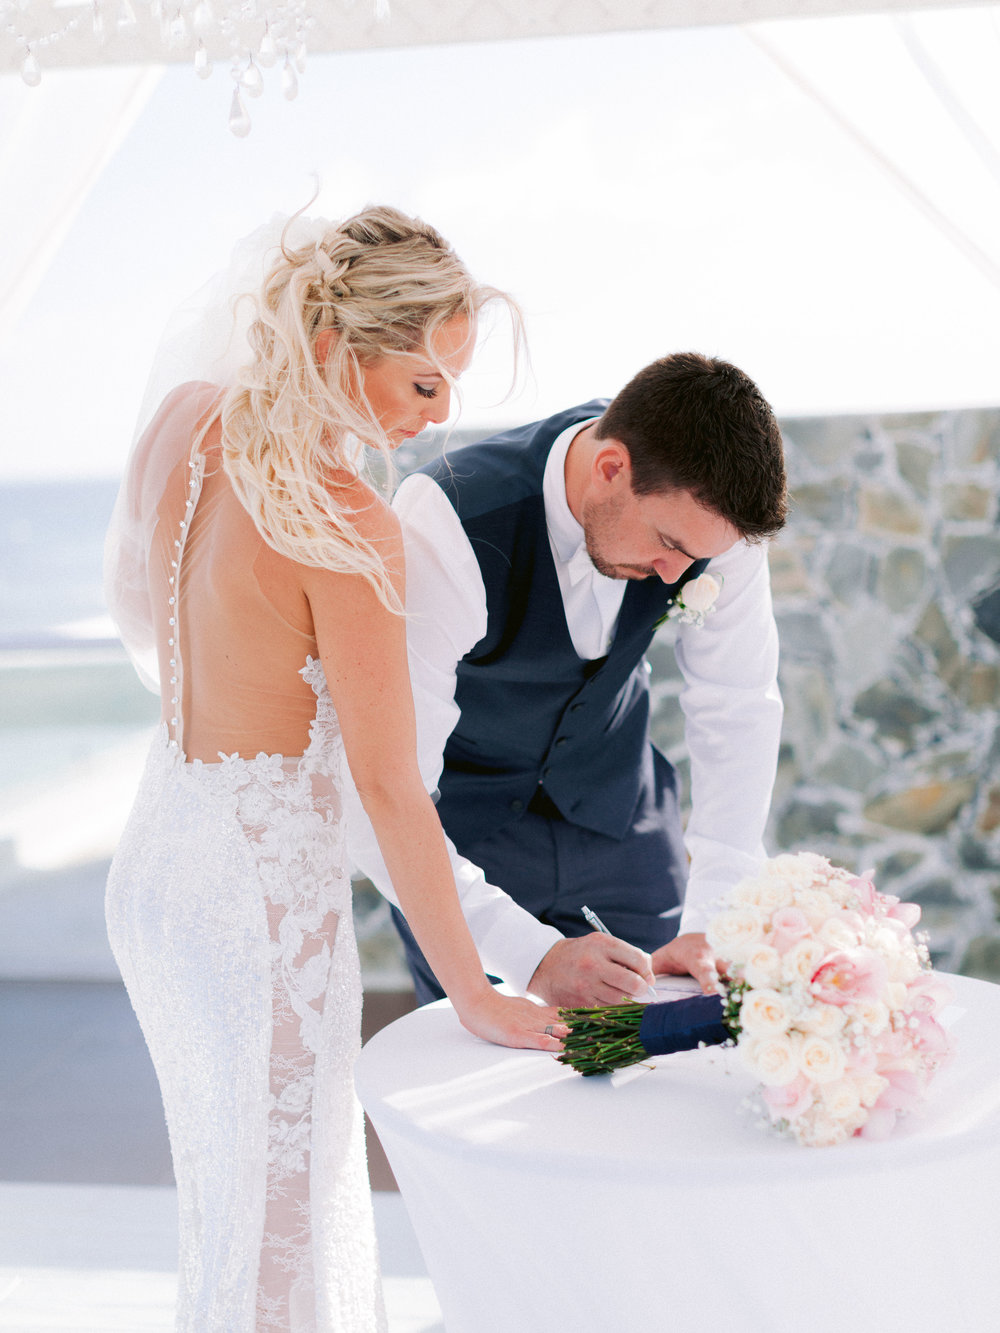 Kim_Jeff_Cancun Wedding_Ceremony_Kurtz_Orpia (91 of 119).jpg